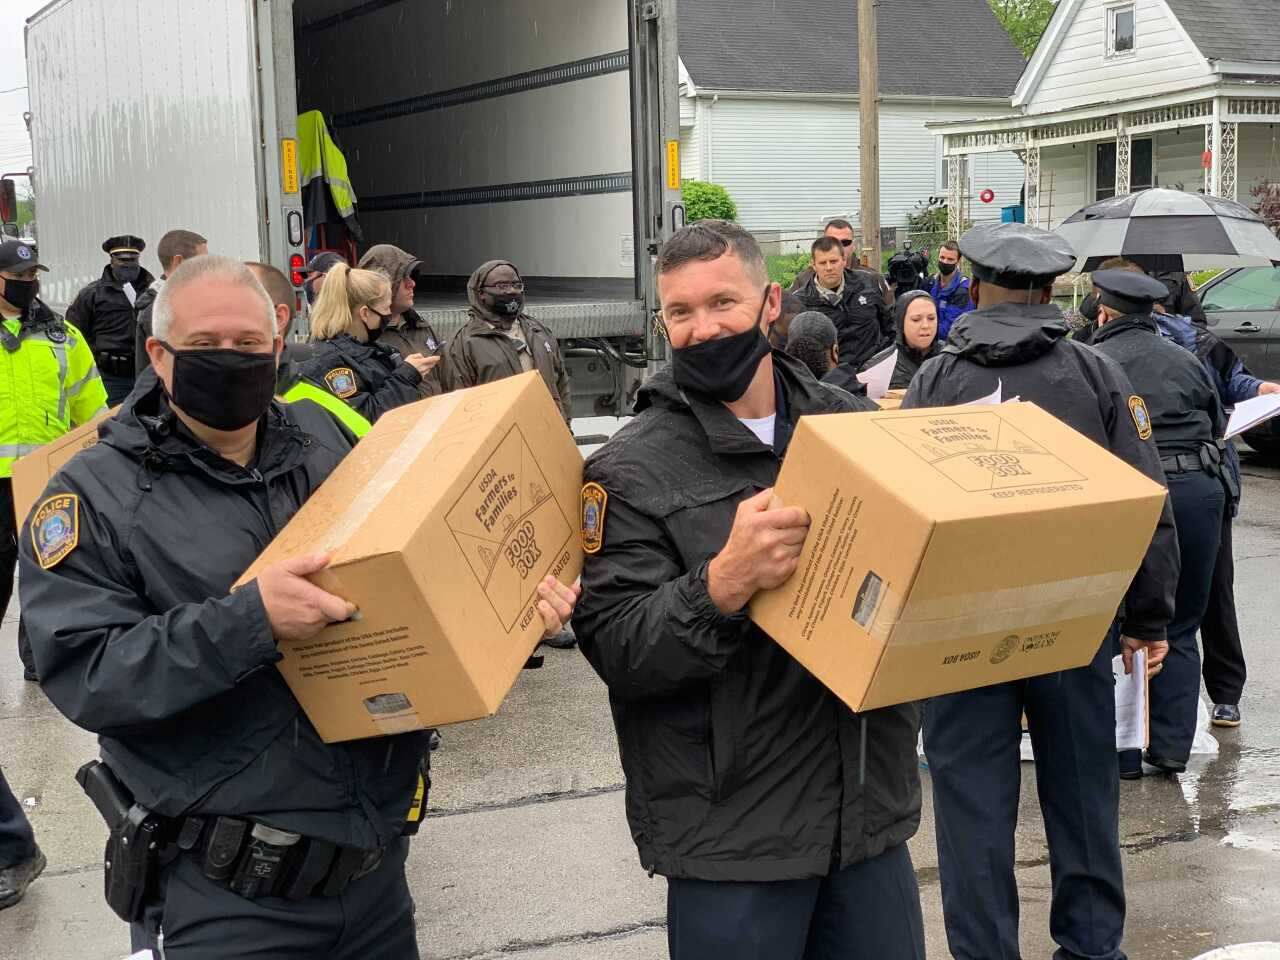 Police loading boxes.jpg